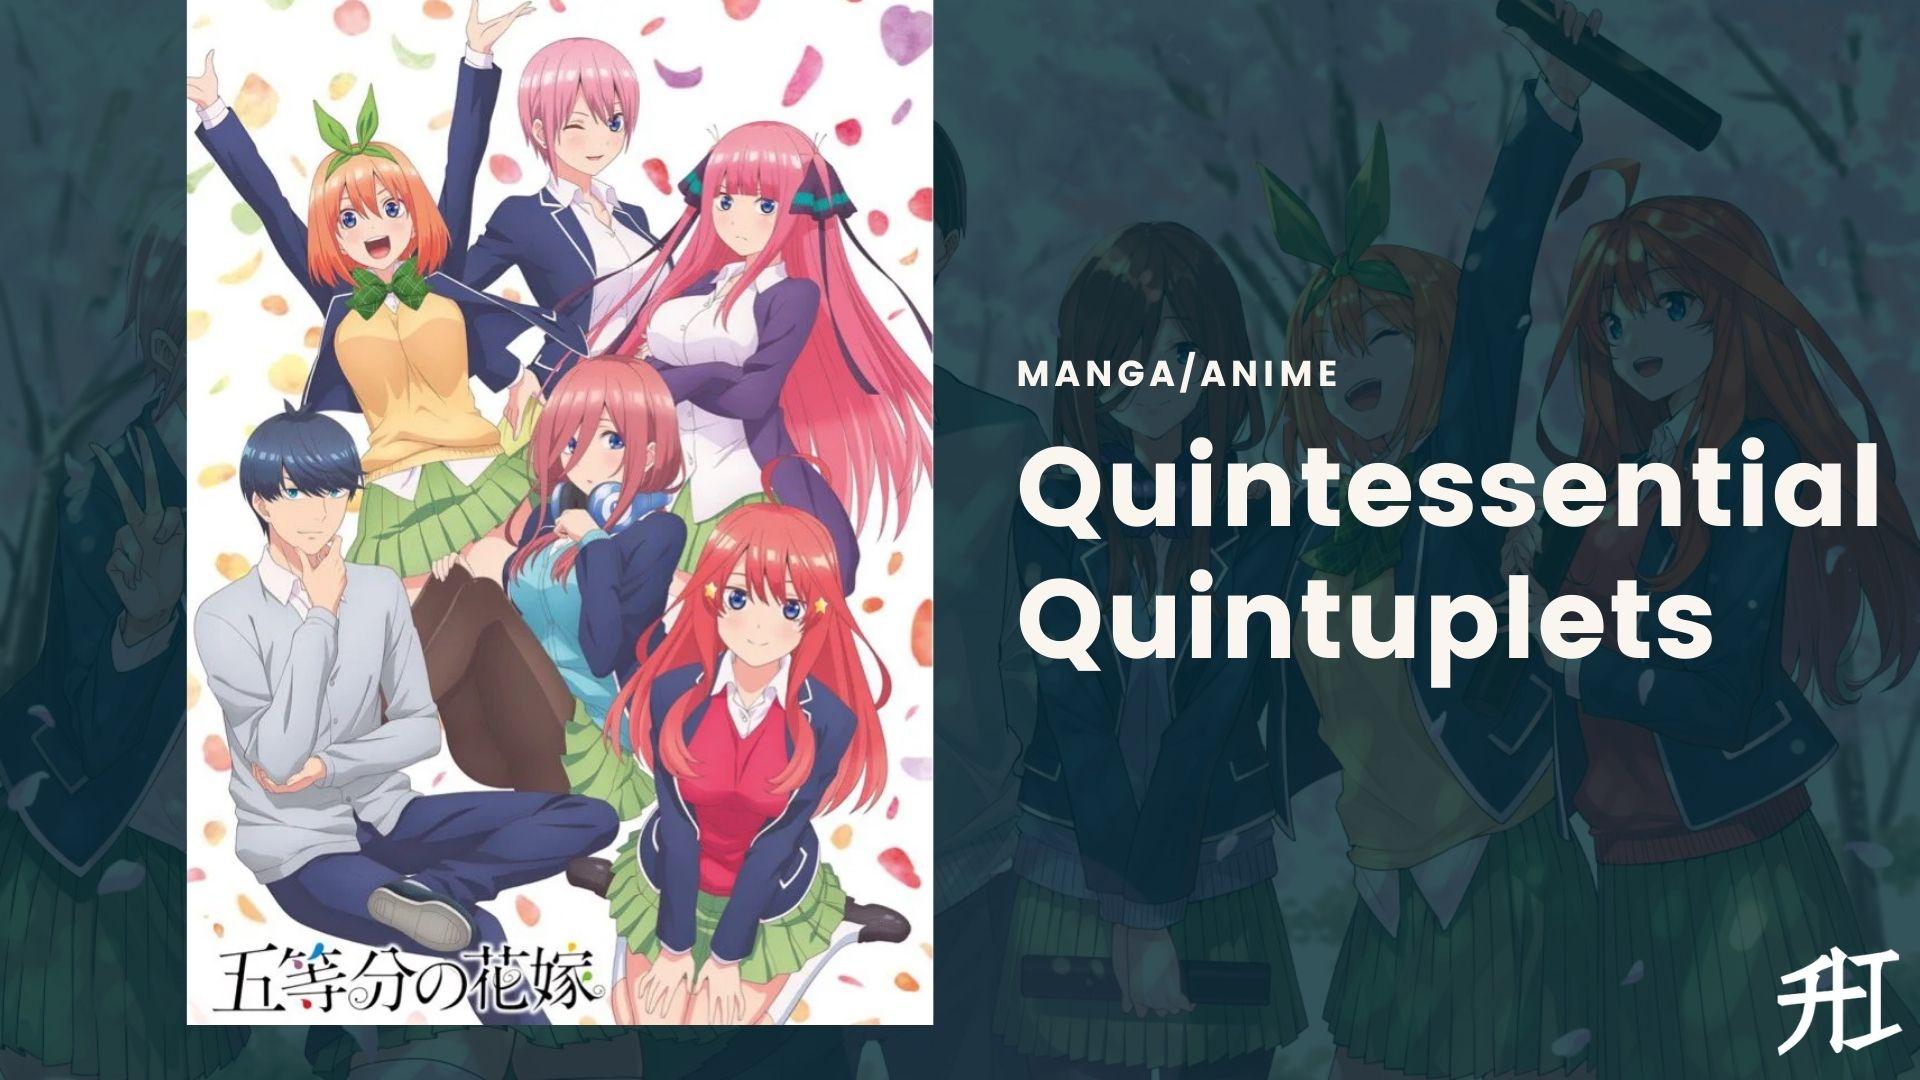 Quintessential Quintuplets - Harem Anime